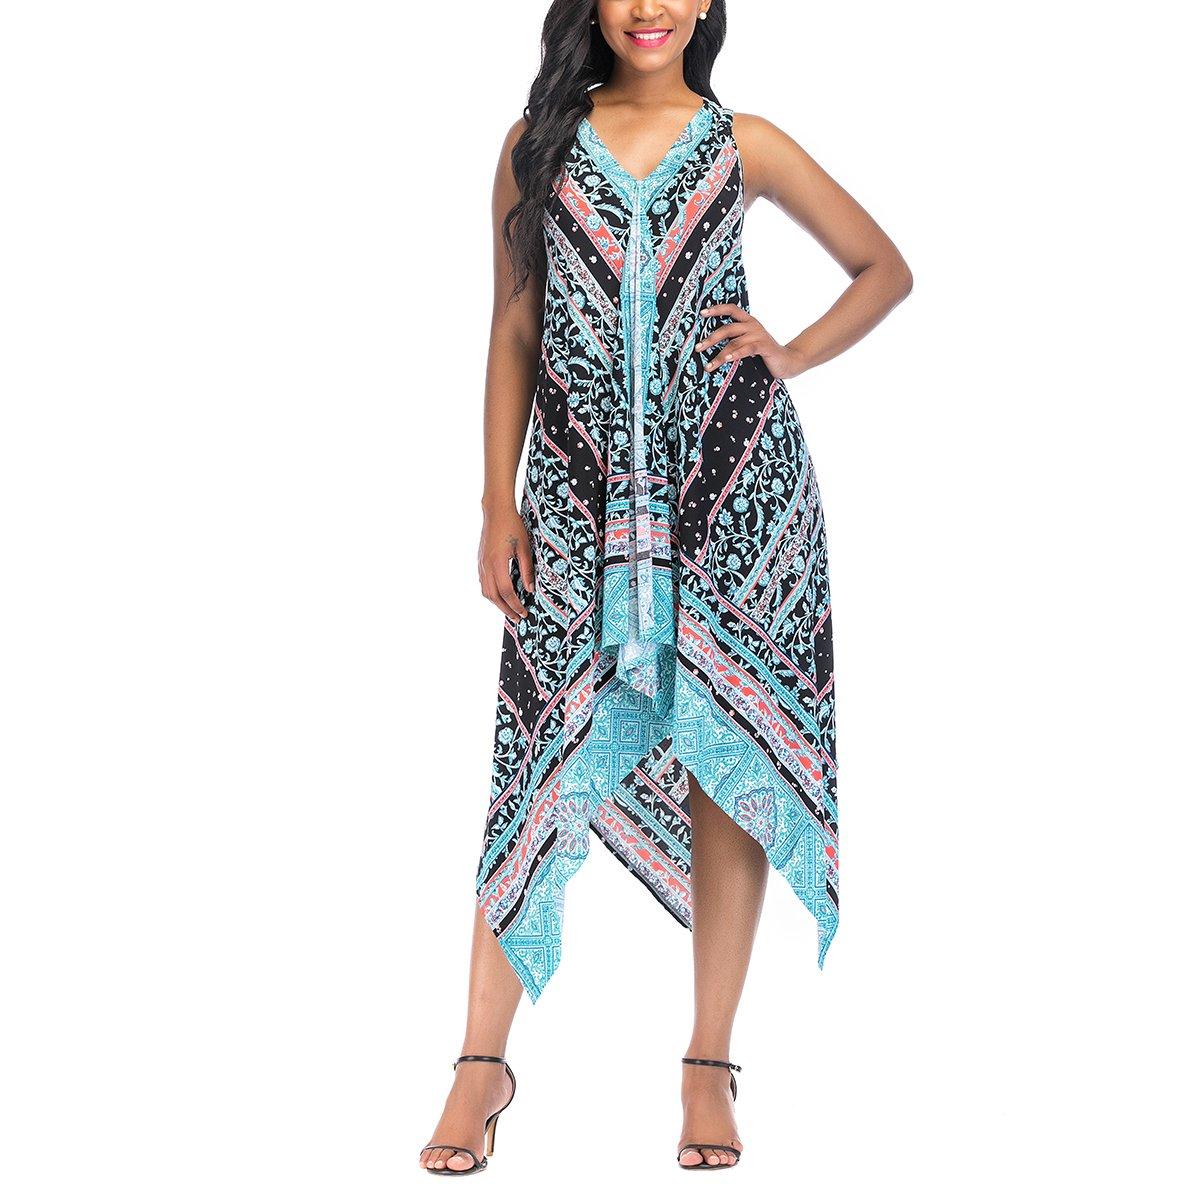 4152b3f7042 ... in summer wear. FEATURES - Ethnic Floral Print   Halter V-Neck    Asymmetrical Handkerchief Hem   Sleeveless   A-Line Dress WAYS TO WEAR -  Easy ...